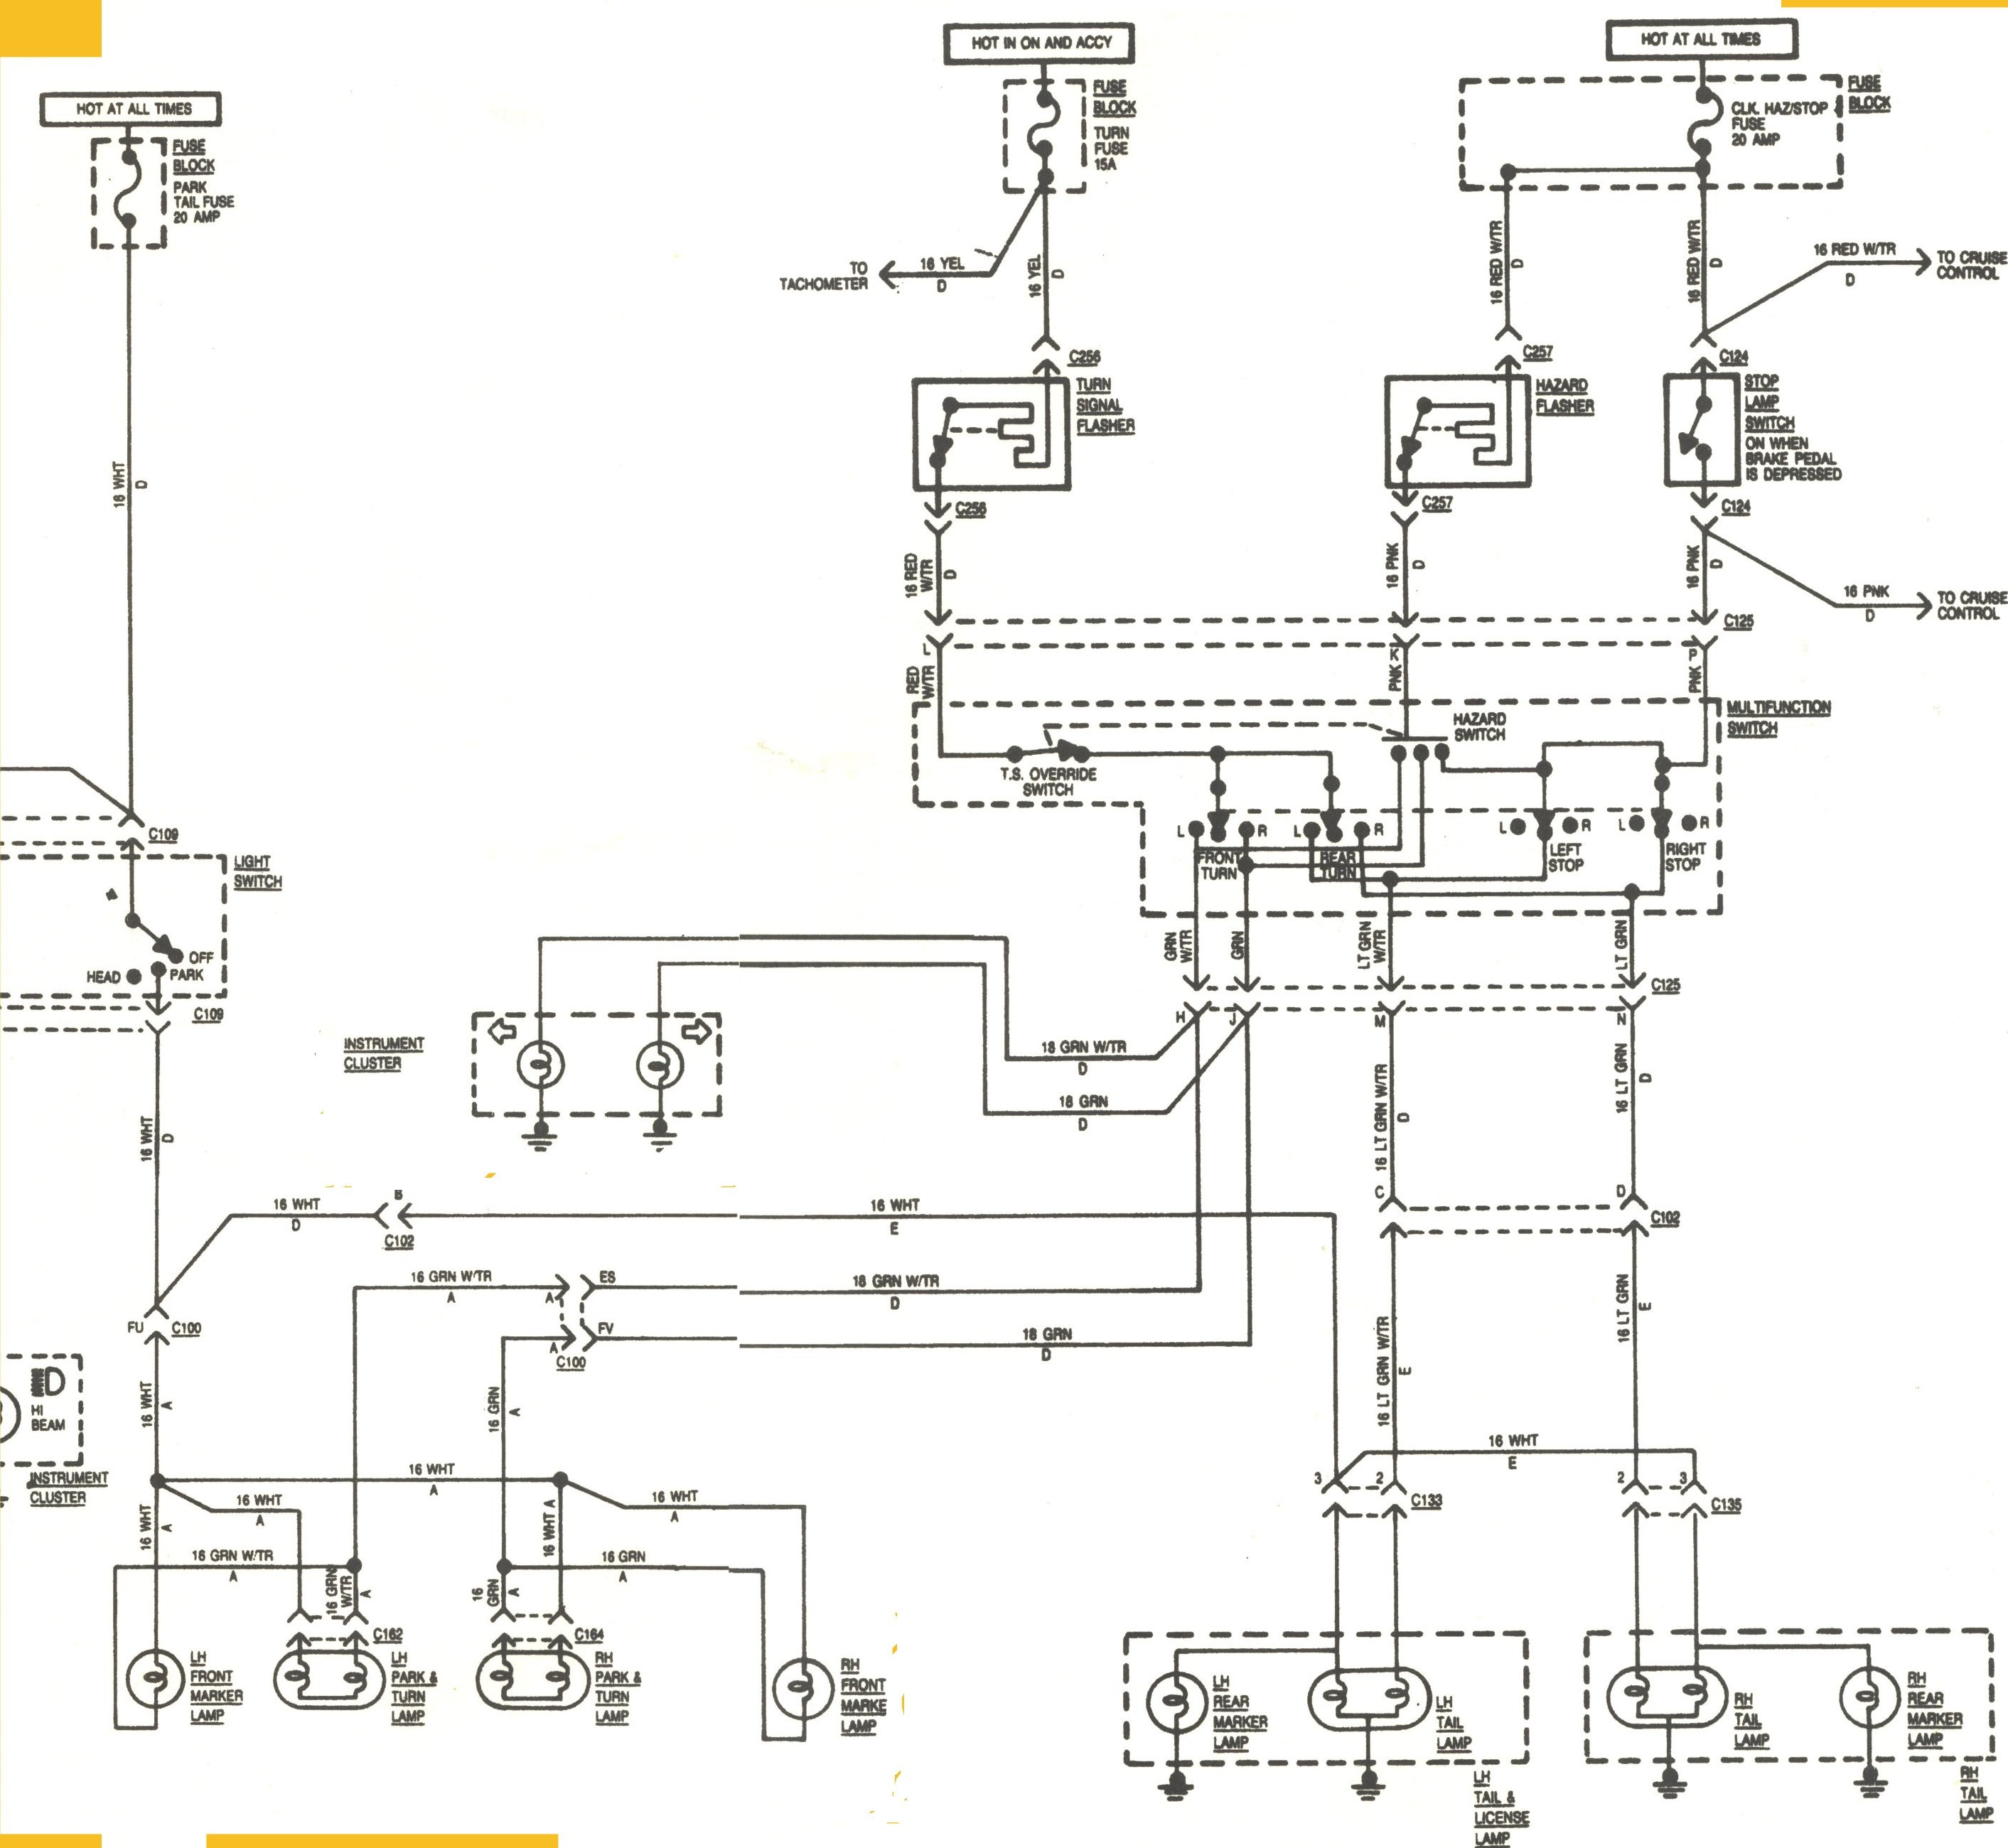 Brilliant Ideas Wiring Diagram 1998 Jeep Tj Wrangler Wiring Diagrams Also 1998  Jeep